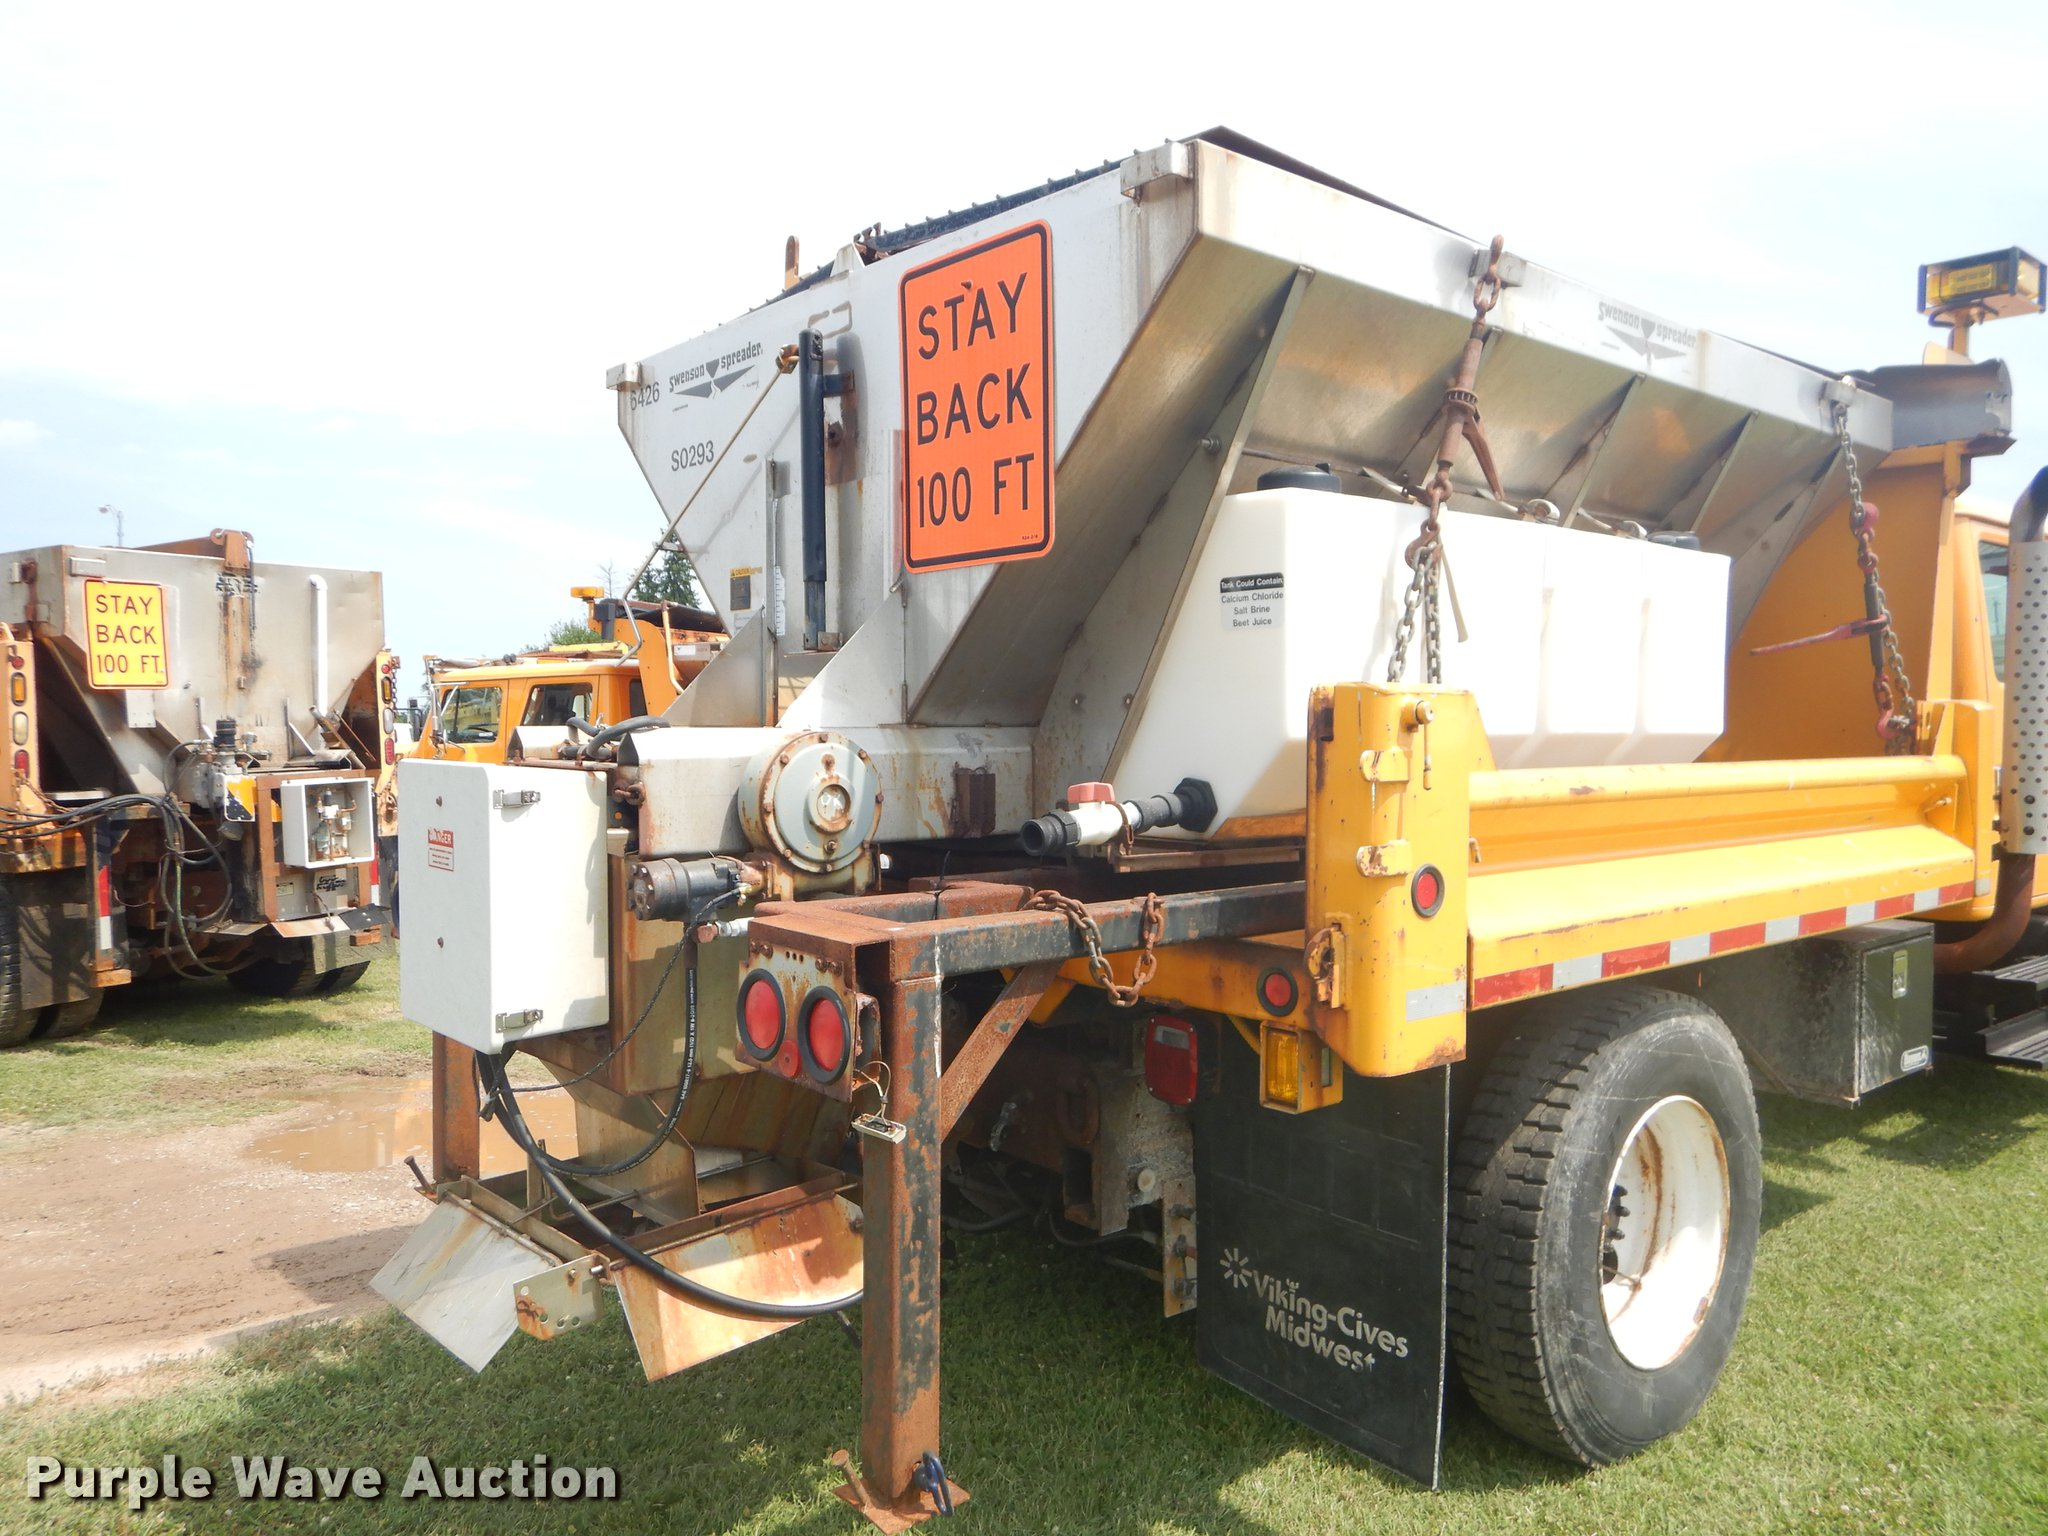 2001 International 4900 Crew Cab Dump Truck Item Ek9525 Viking Cives Snow Plow Wiring Diagram Full Size In New Window